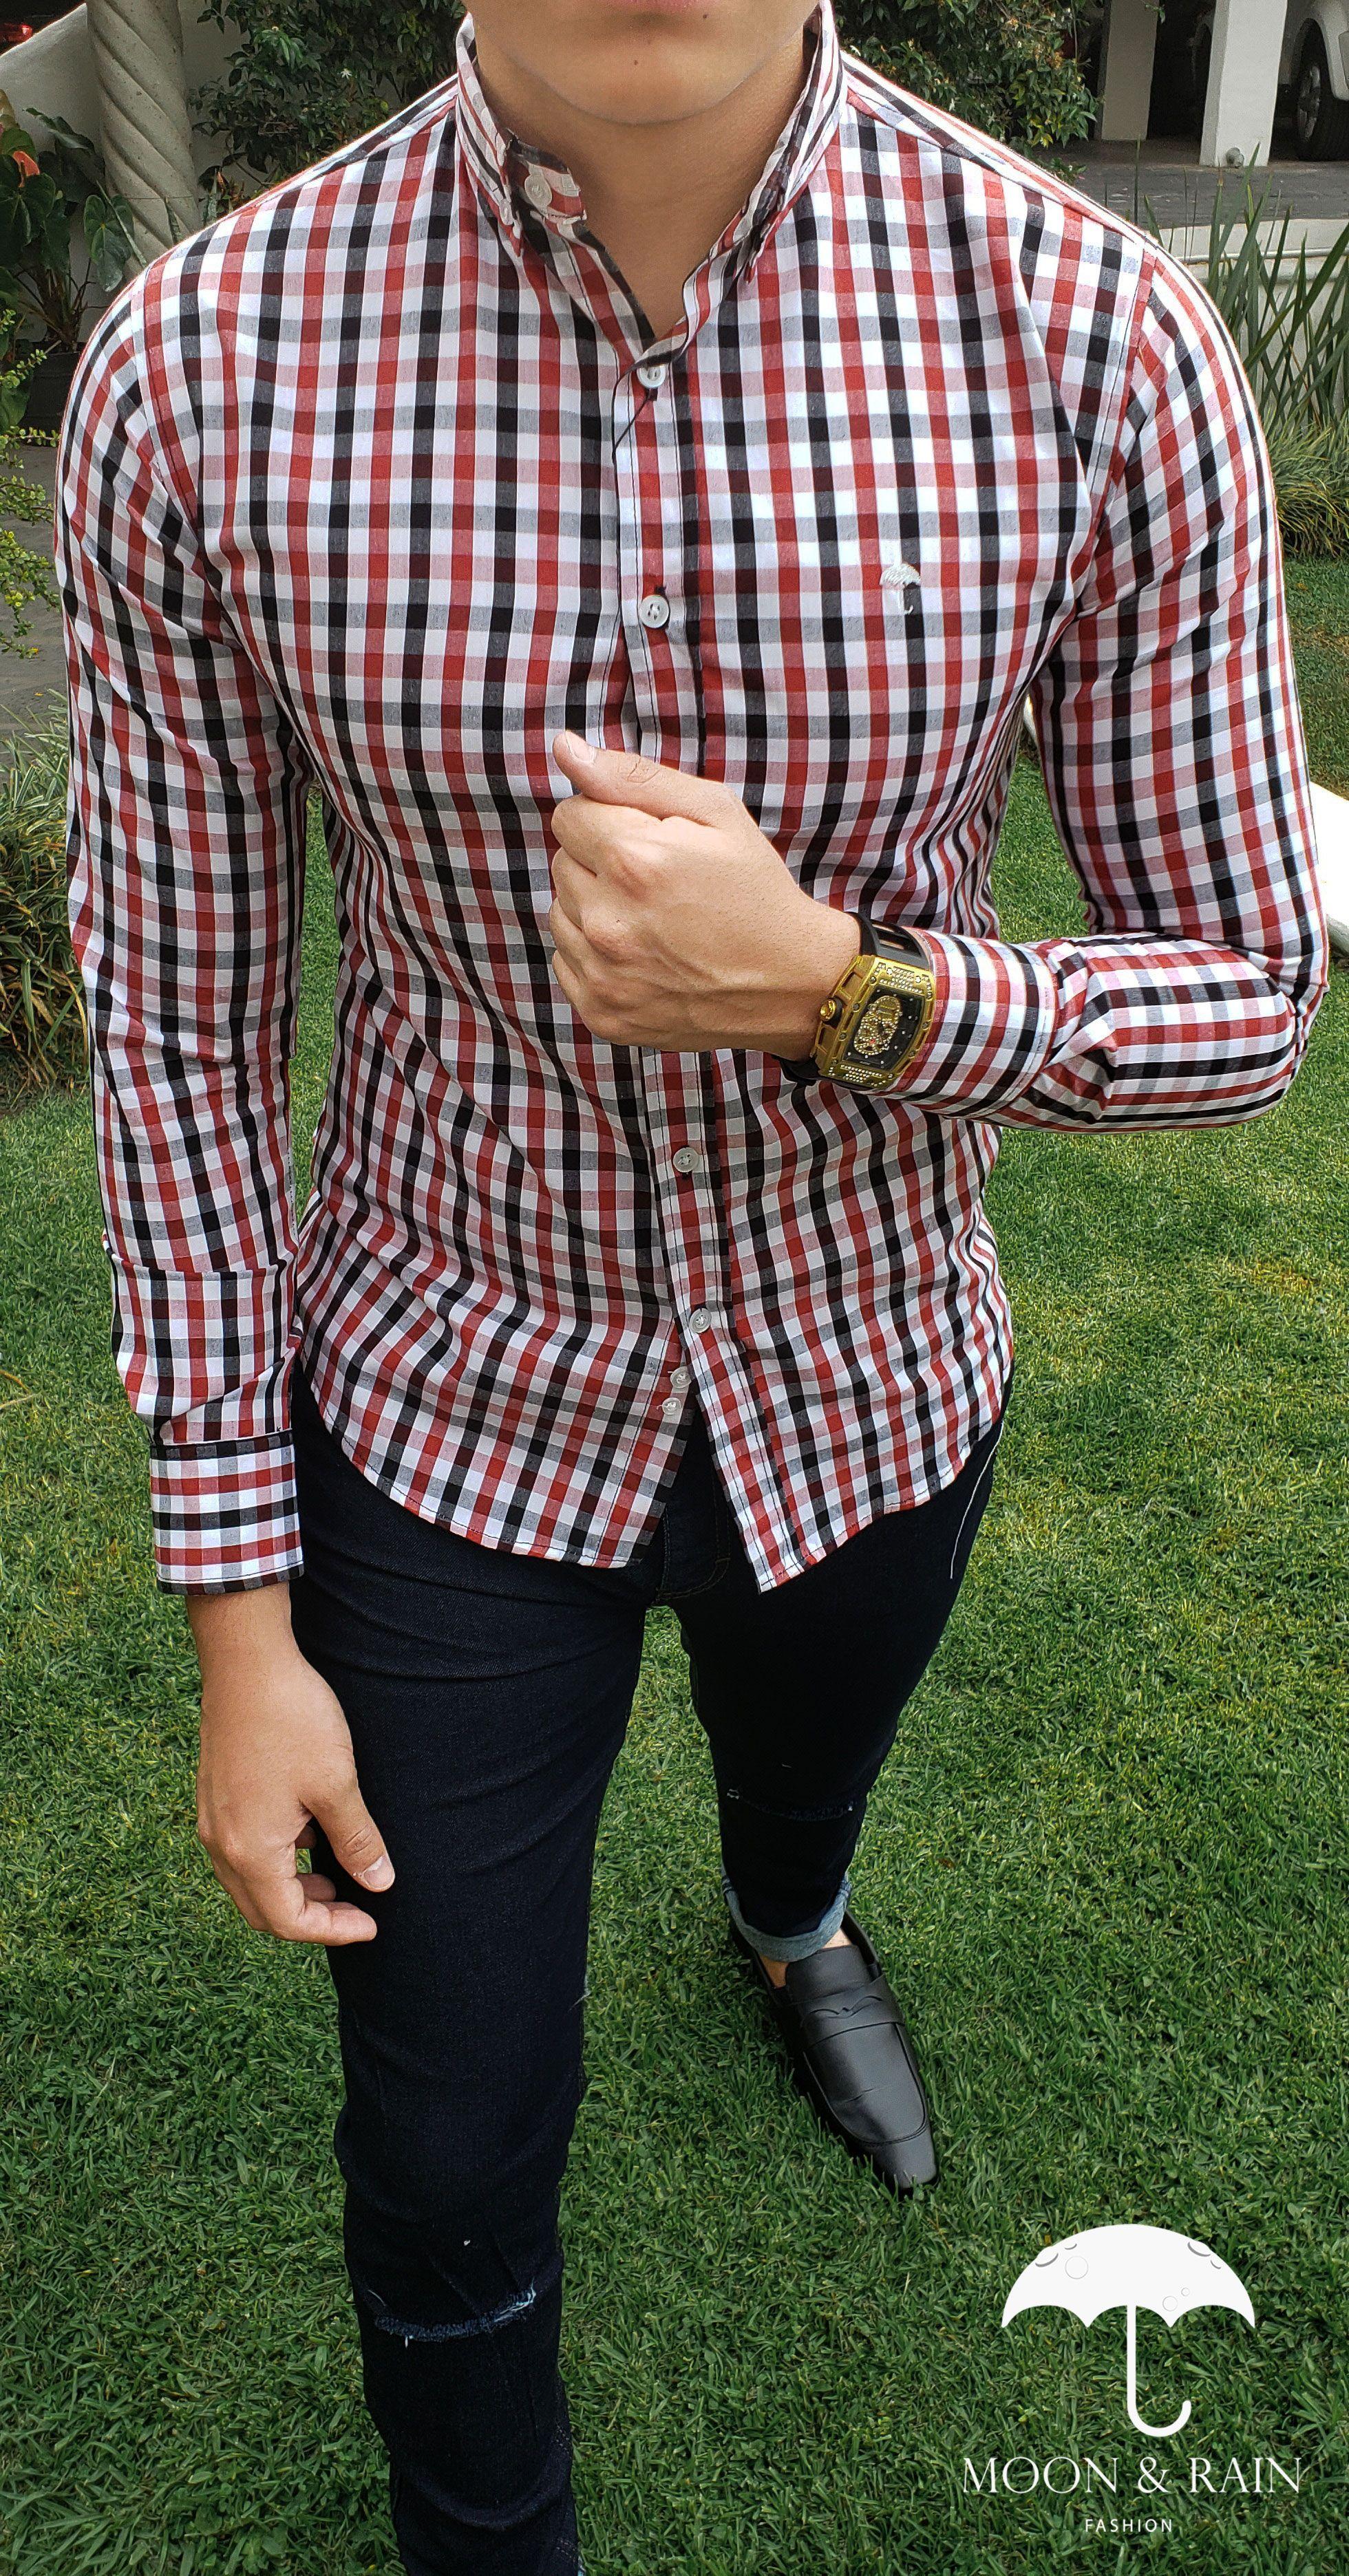 591611a1b1 Outfit para hombre  camisa slim fit de cuadros rojos